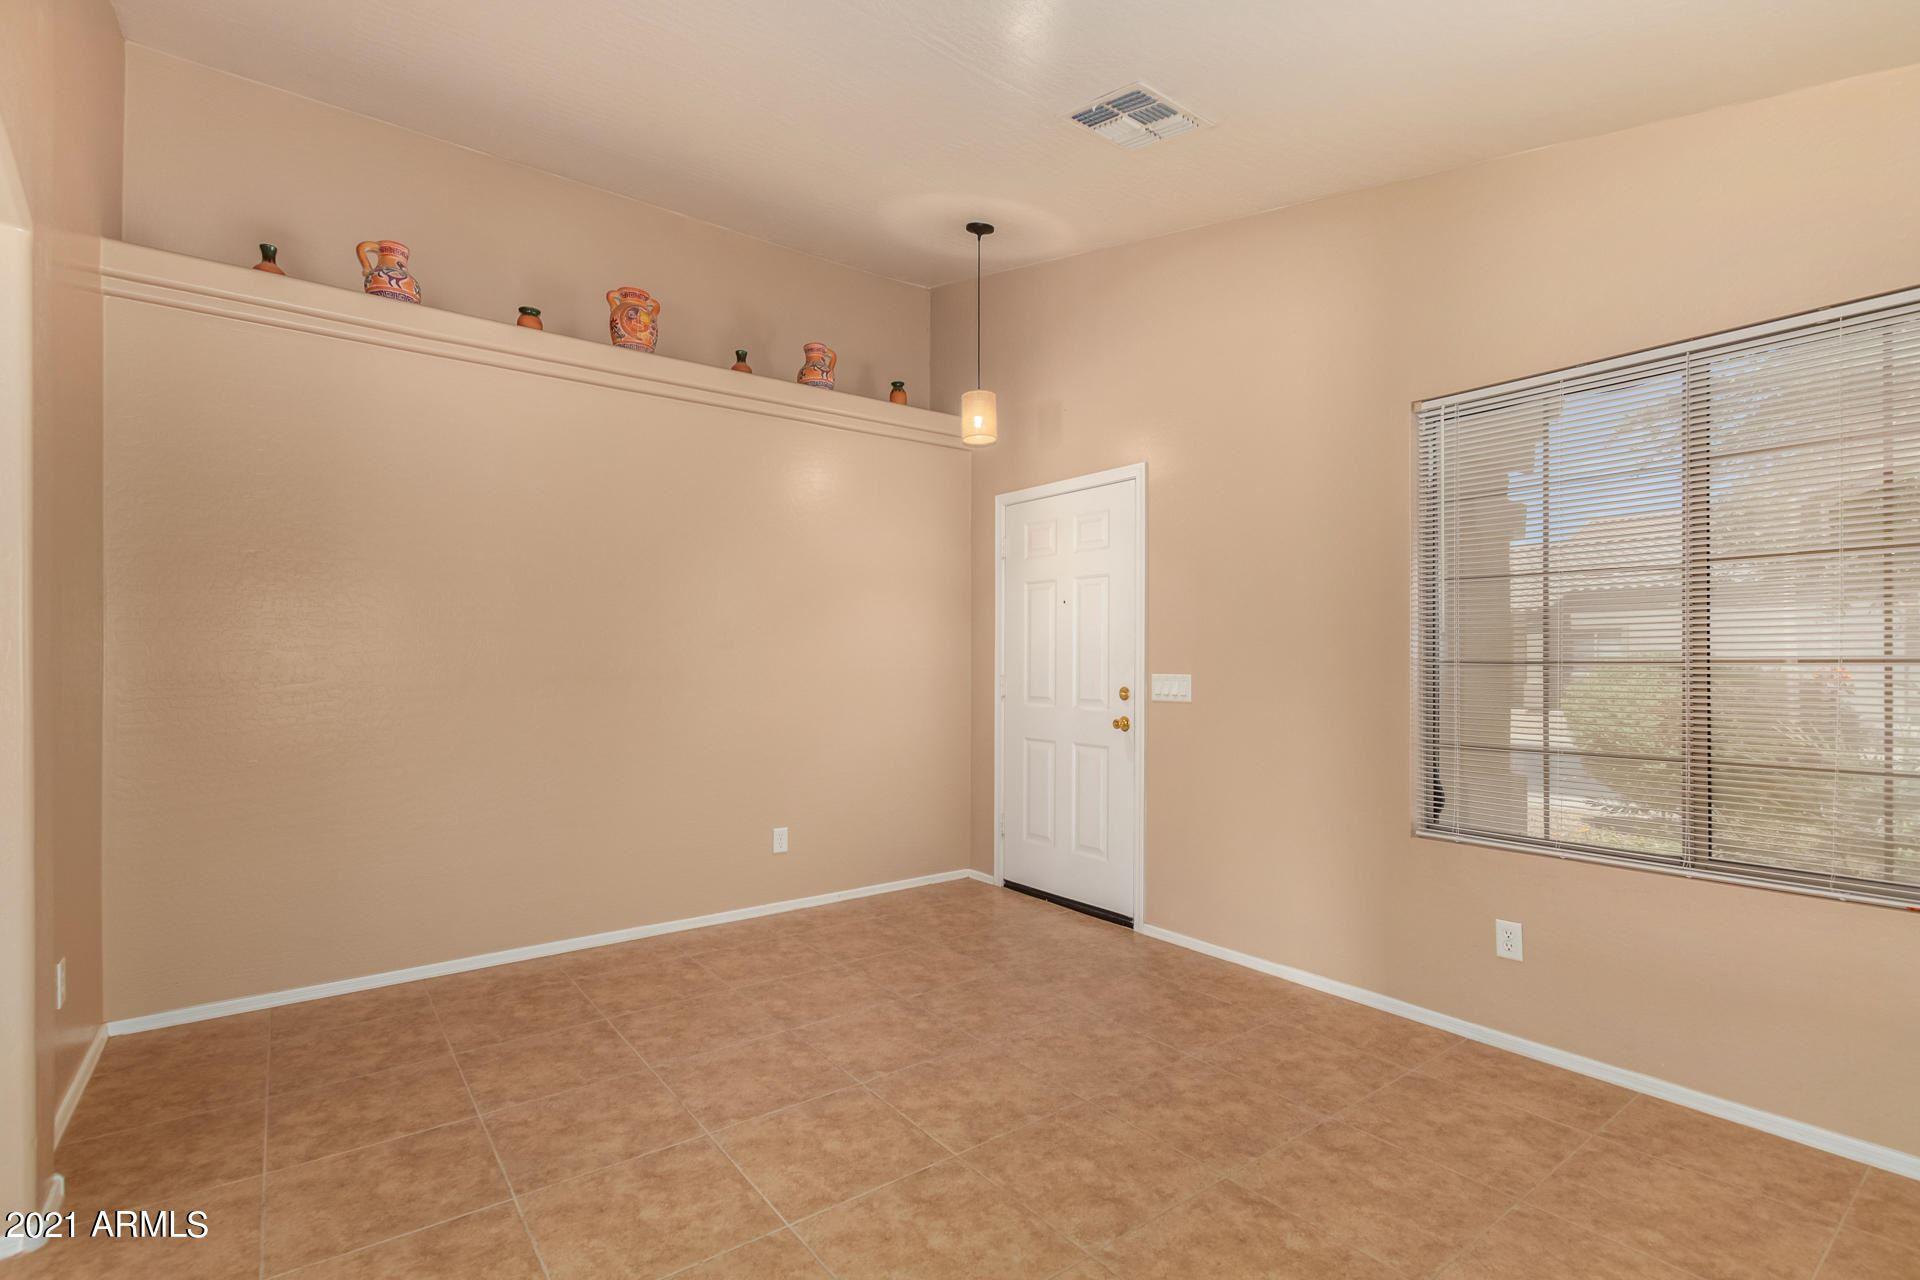 Photo of 14602 N 124TH Lane, El Mirage, AZ 85335 (MLS # 6249195)